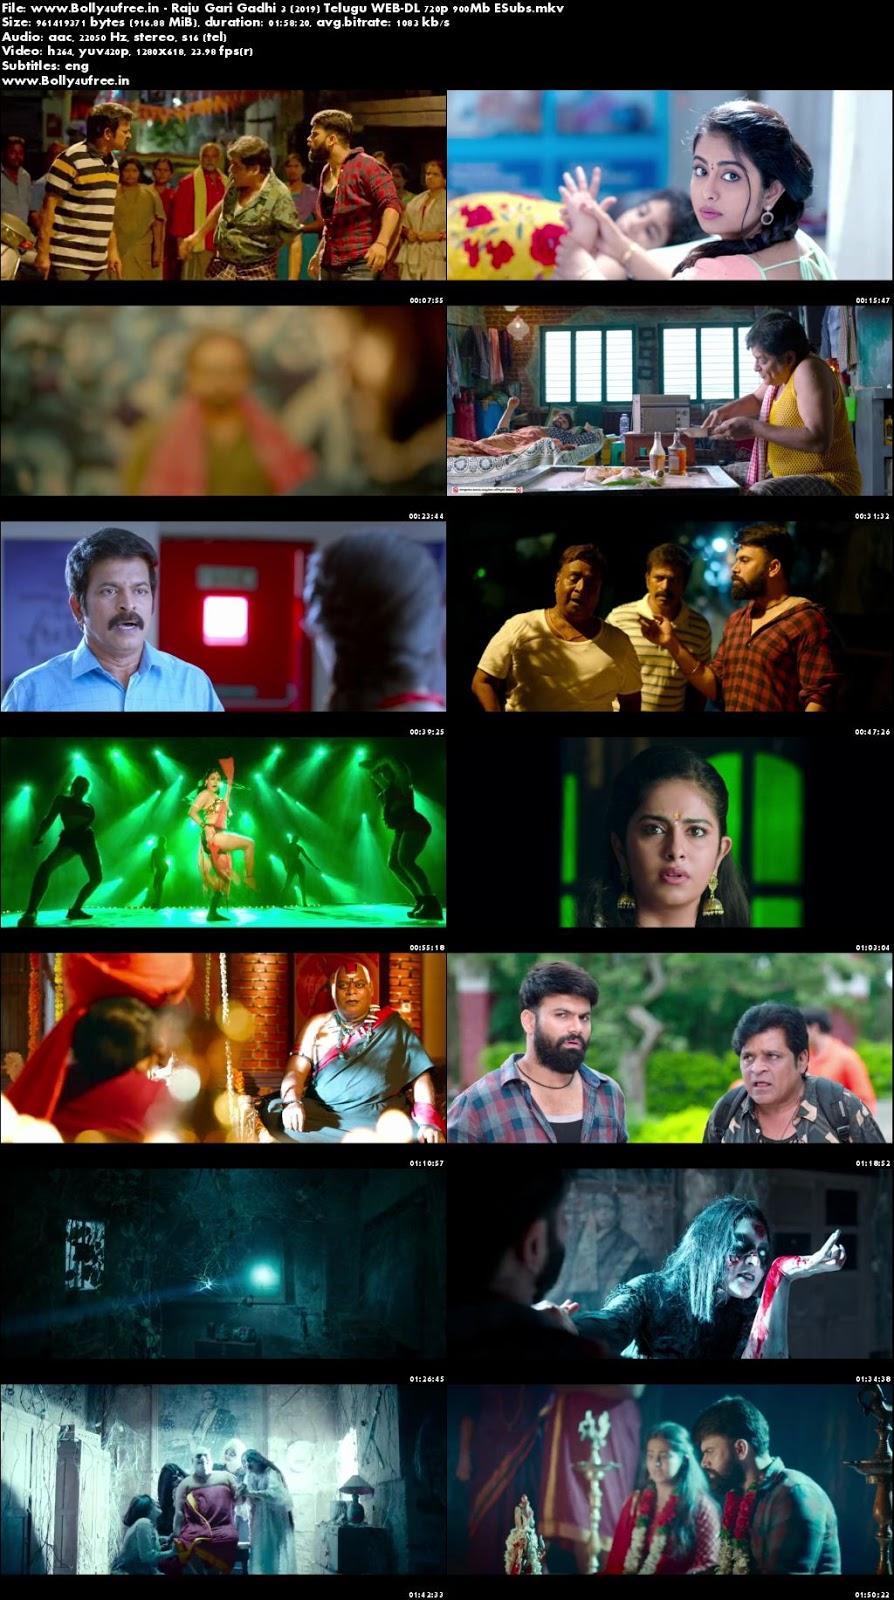 Raju Gari Gadhi 3 2019 Telugu WEB-DL 720p 900Mb ESubs